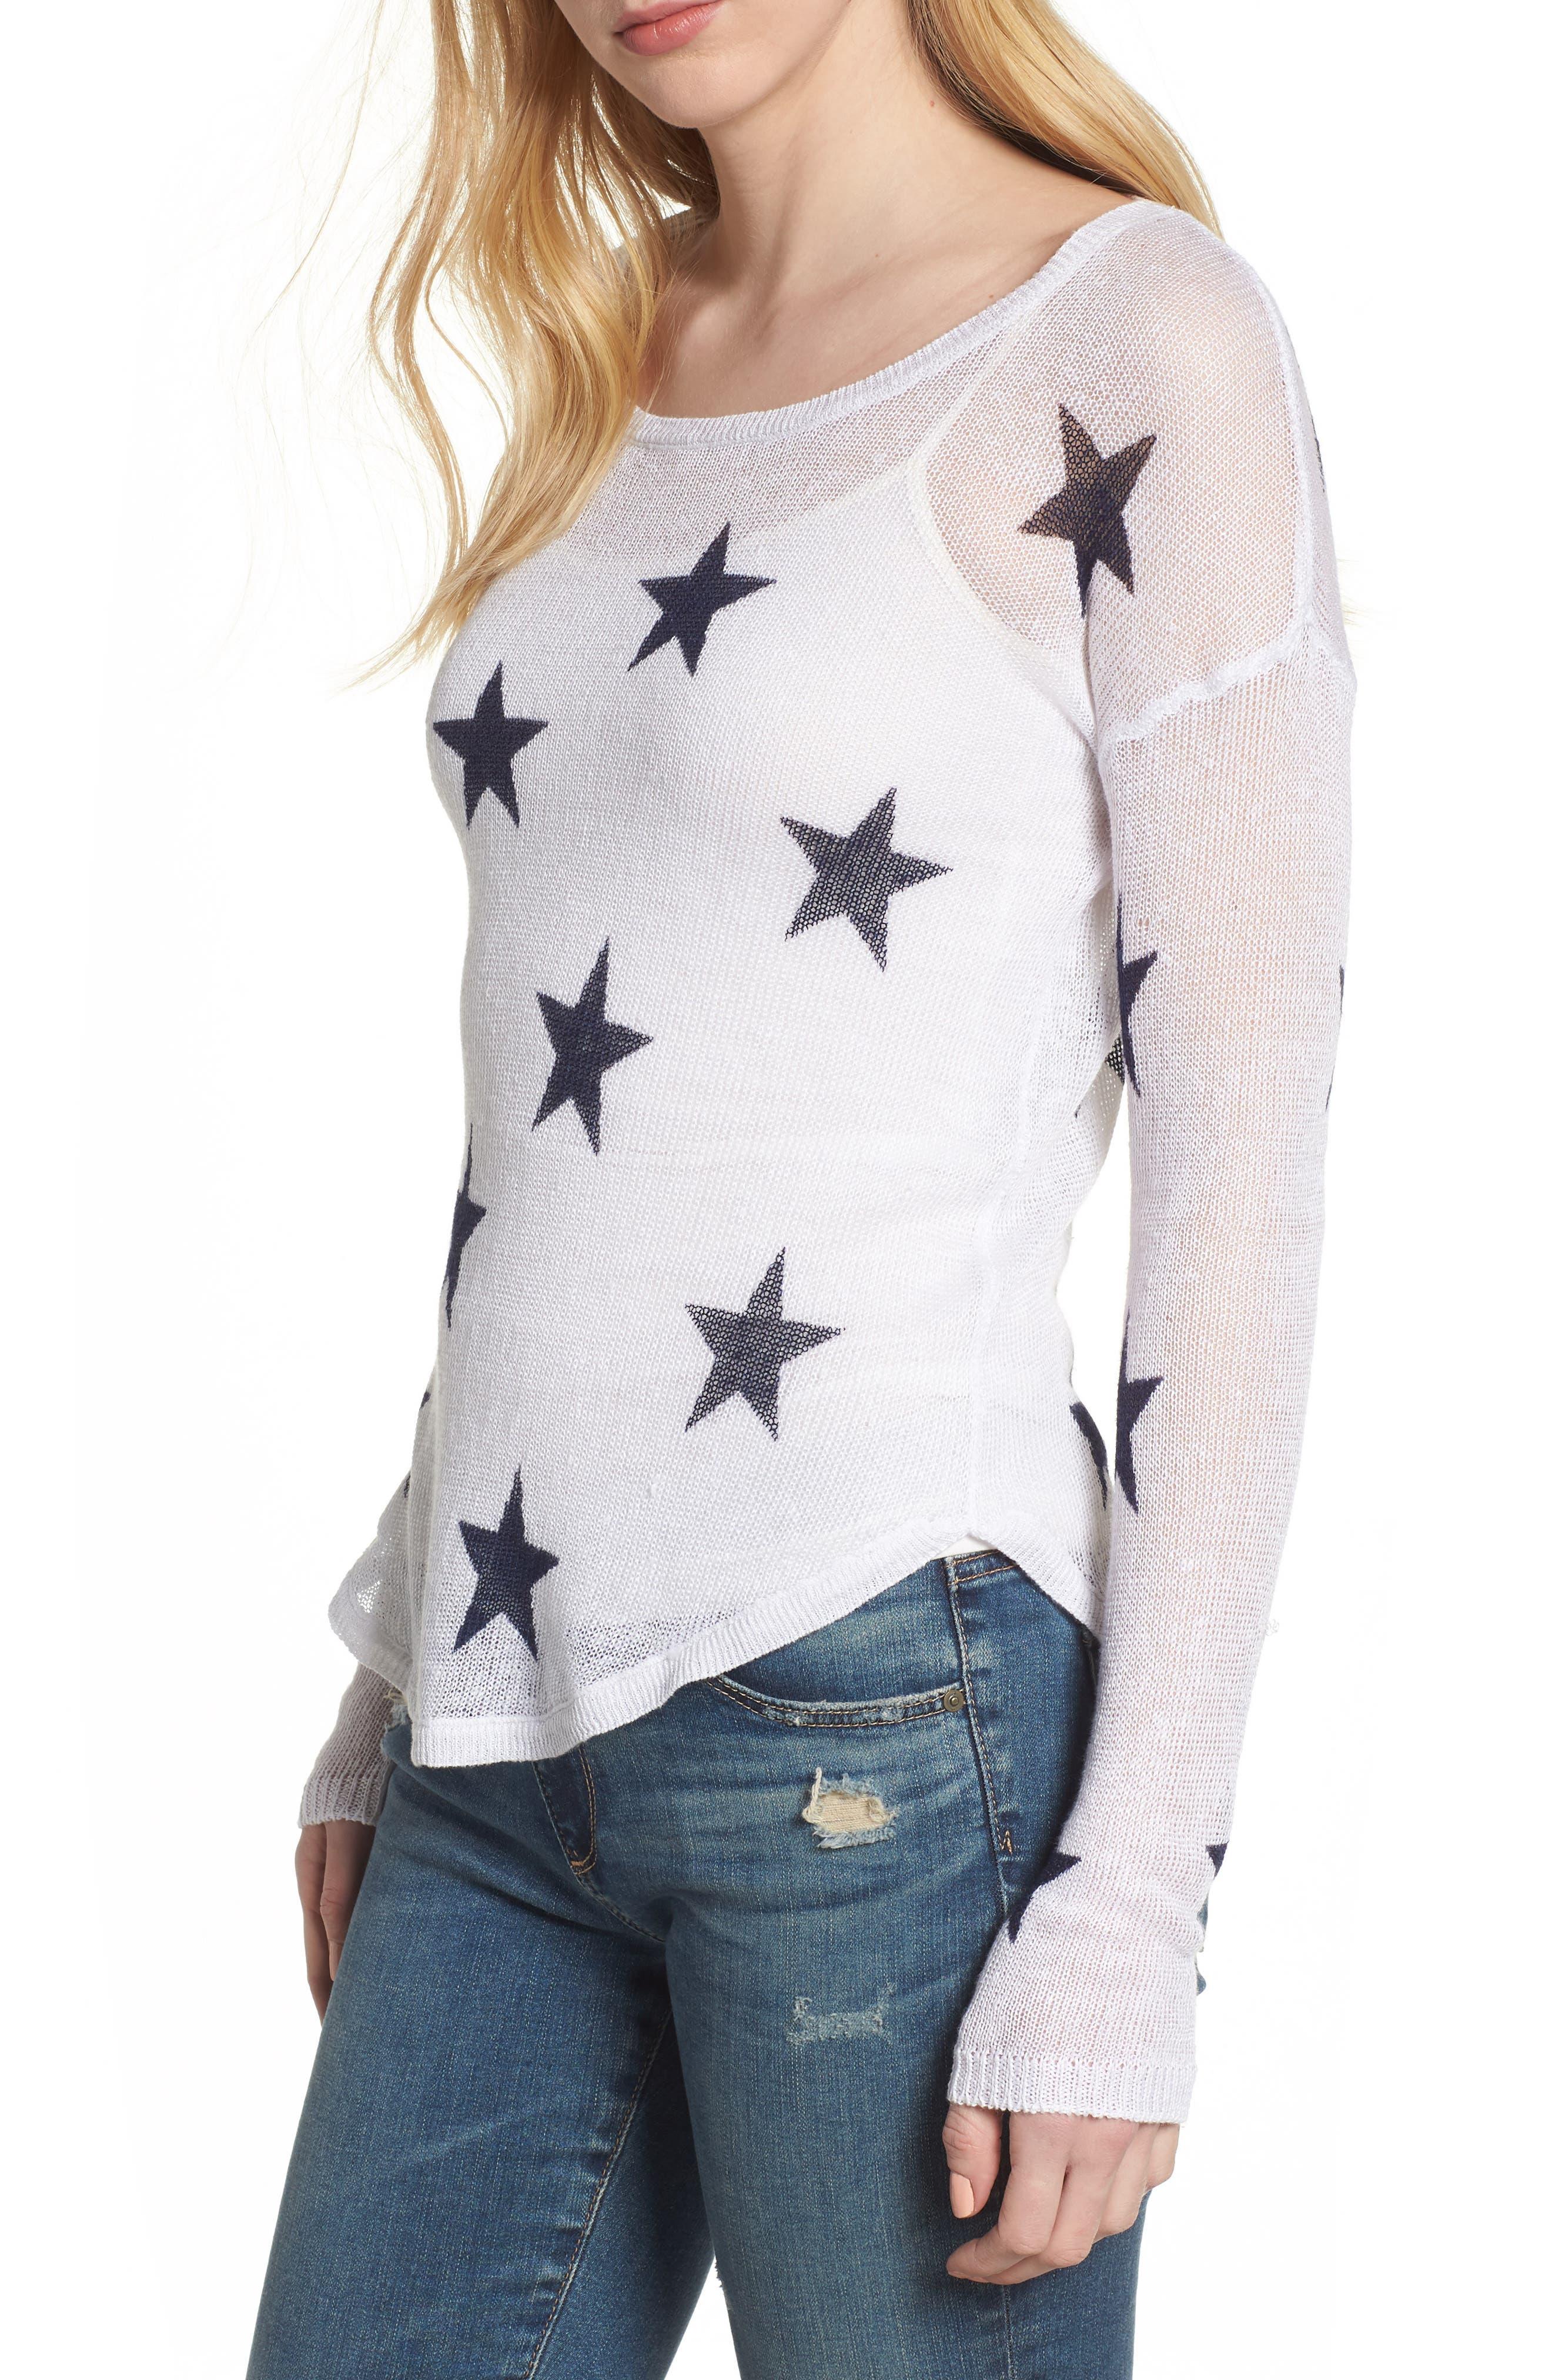 Perri Linen Sweater,                             Main thumbnail 1, color,                             White Navy Stars